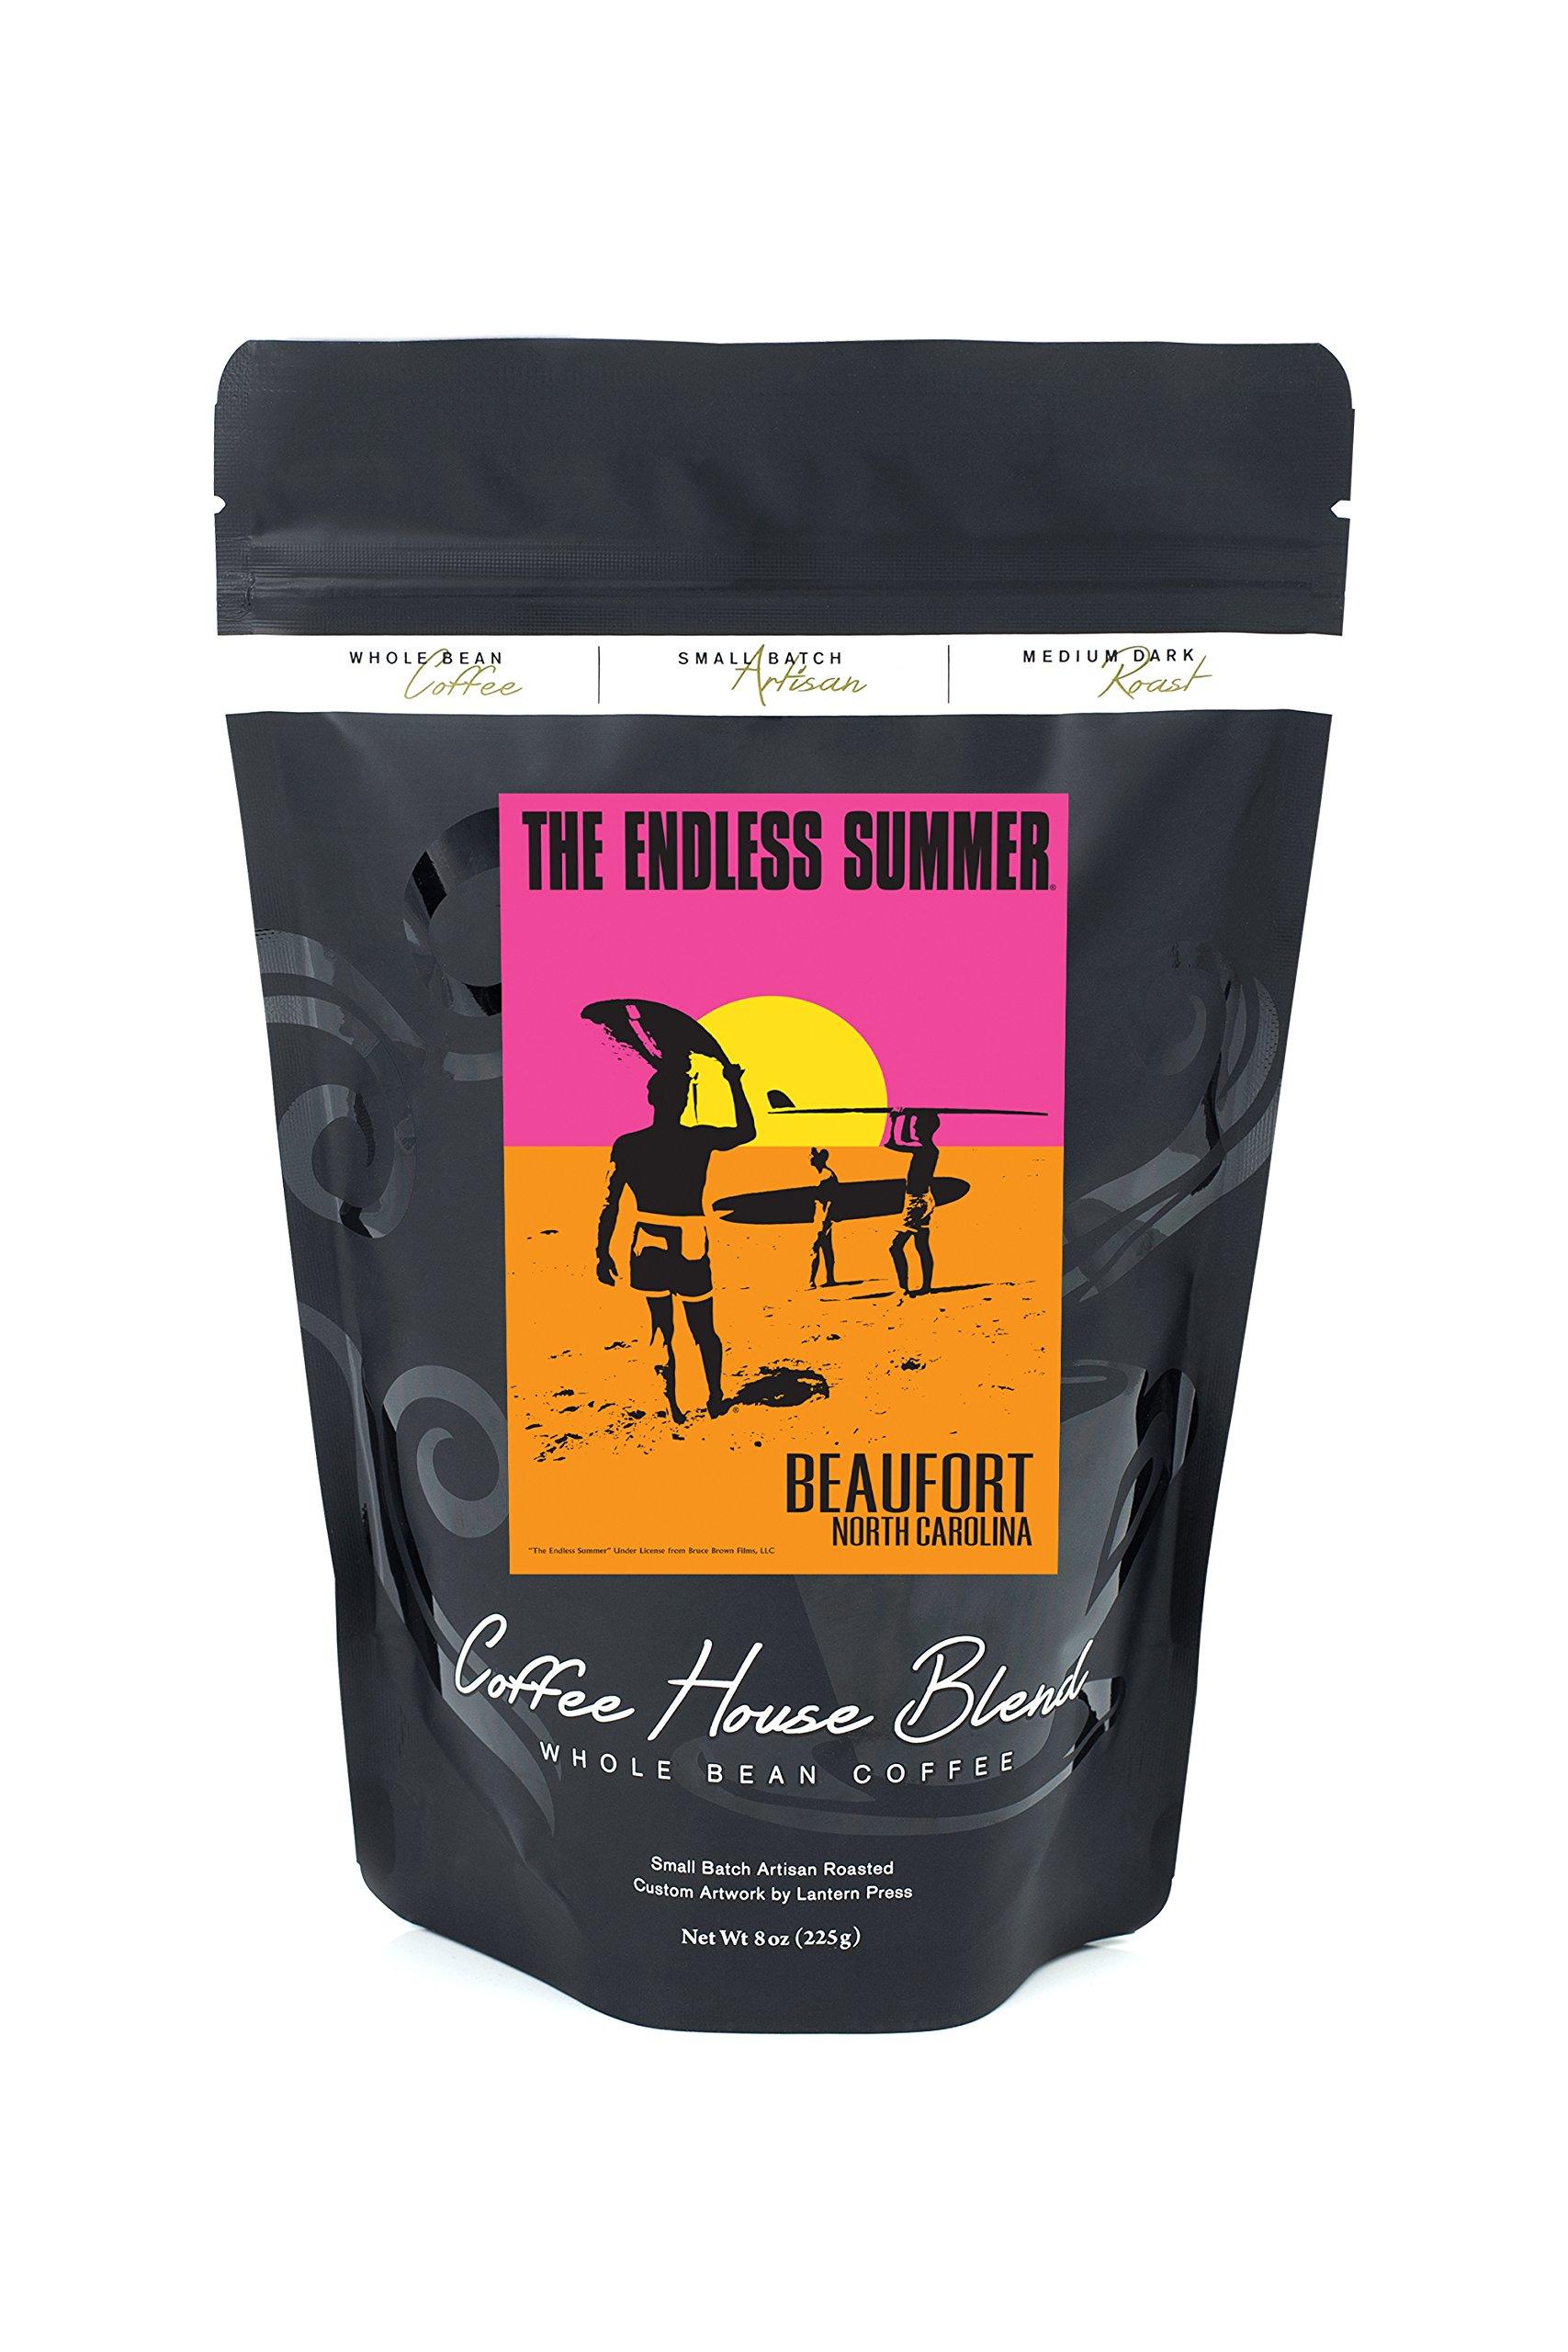 Beaufort, North Carolina - The Endless Summer - Original Movie Poster (8oz Whole Bean Small Batch Artisan Coffee - Bold & Strong Medium Dark Roast w/ Artwork)